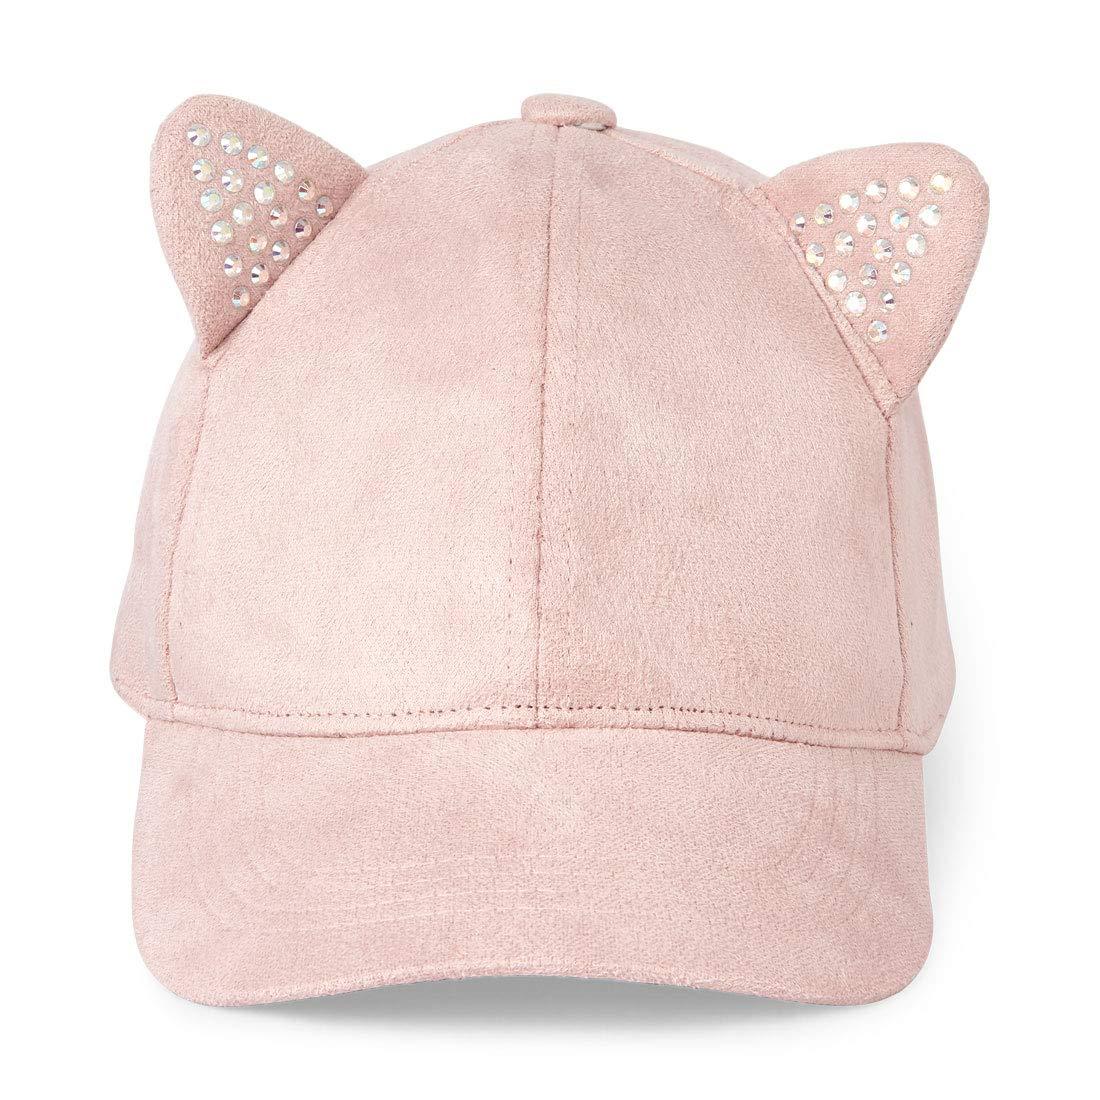 The Children's Place Girls' Big Fashion Baseball CAPS, Soft Rose, L/XL(8+YR)